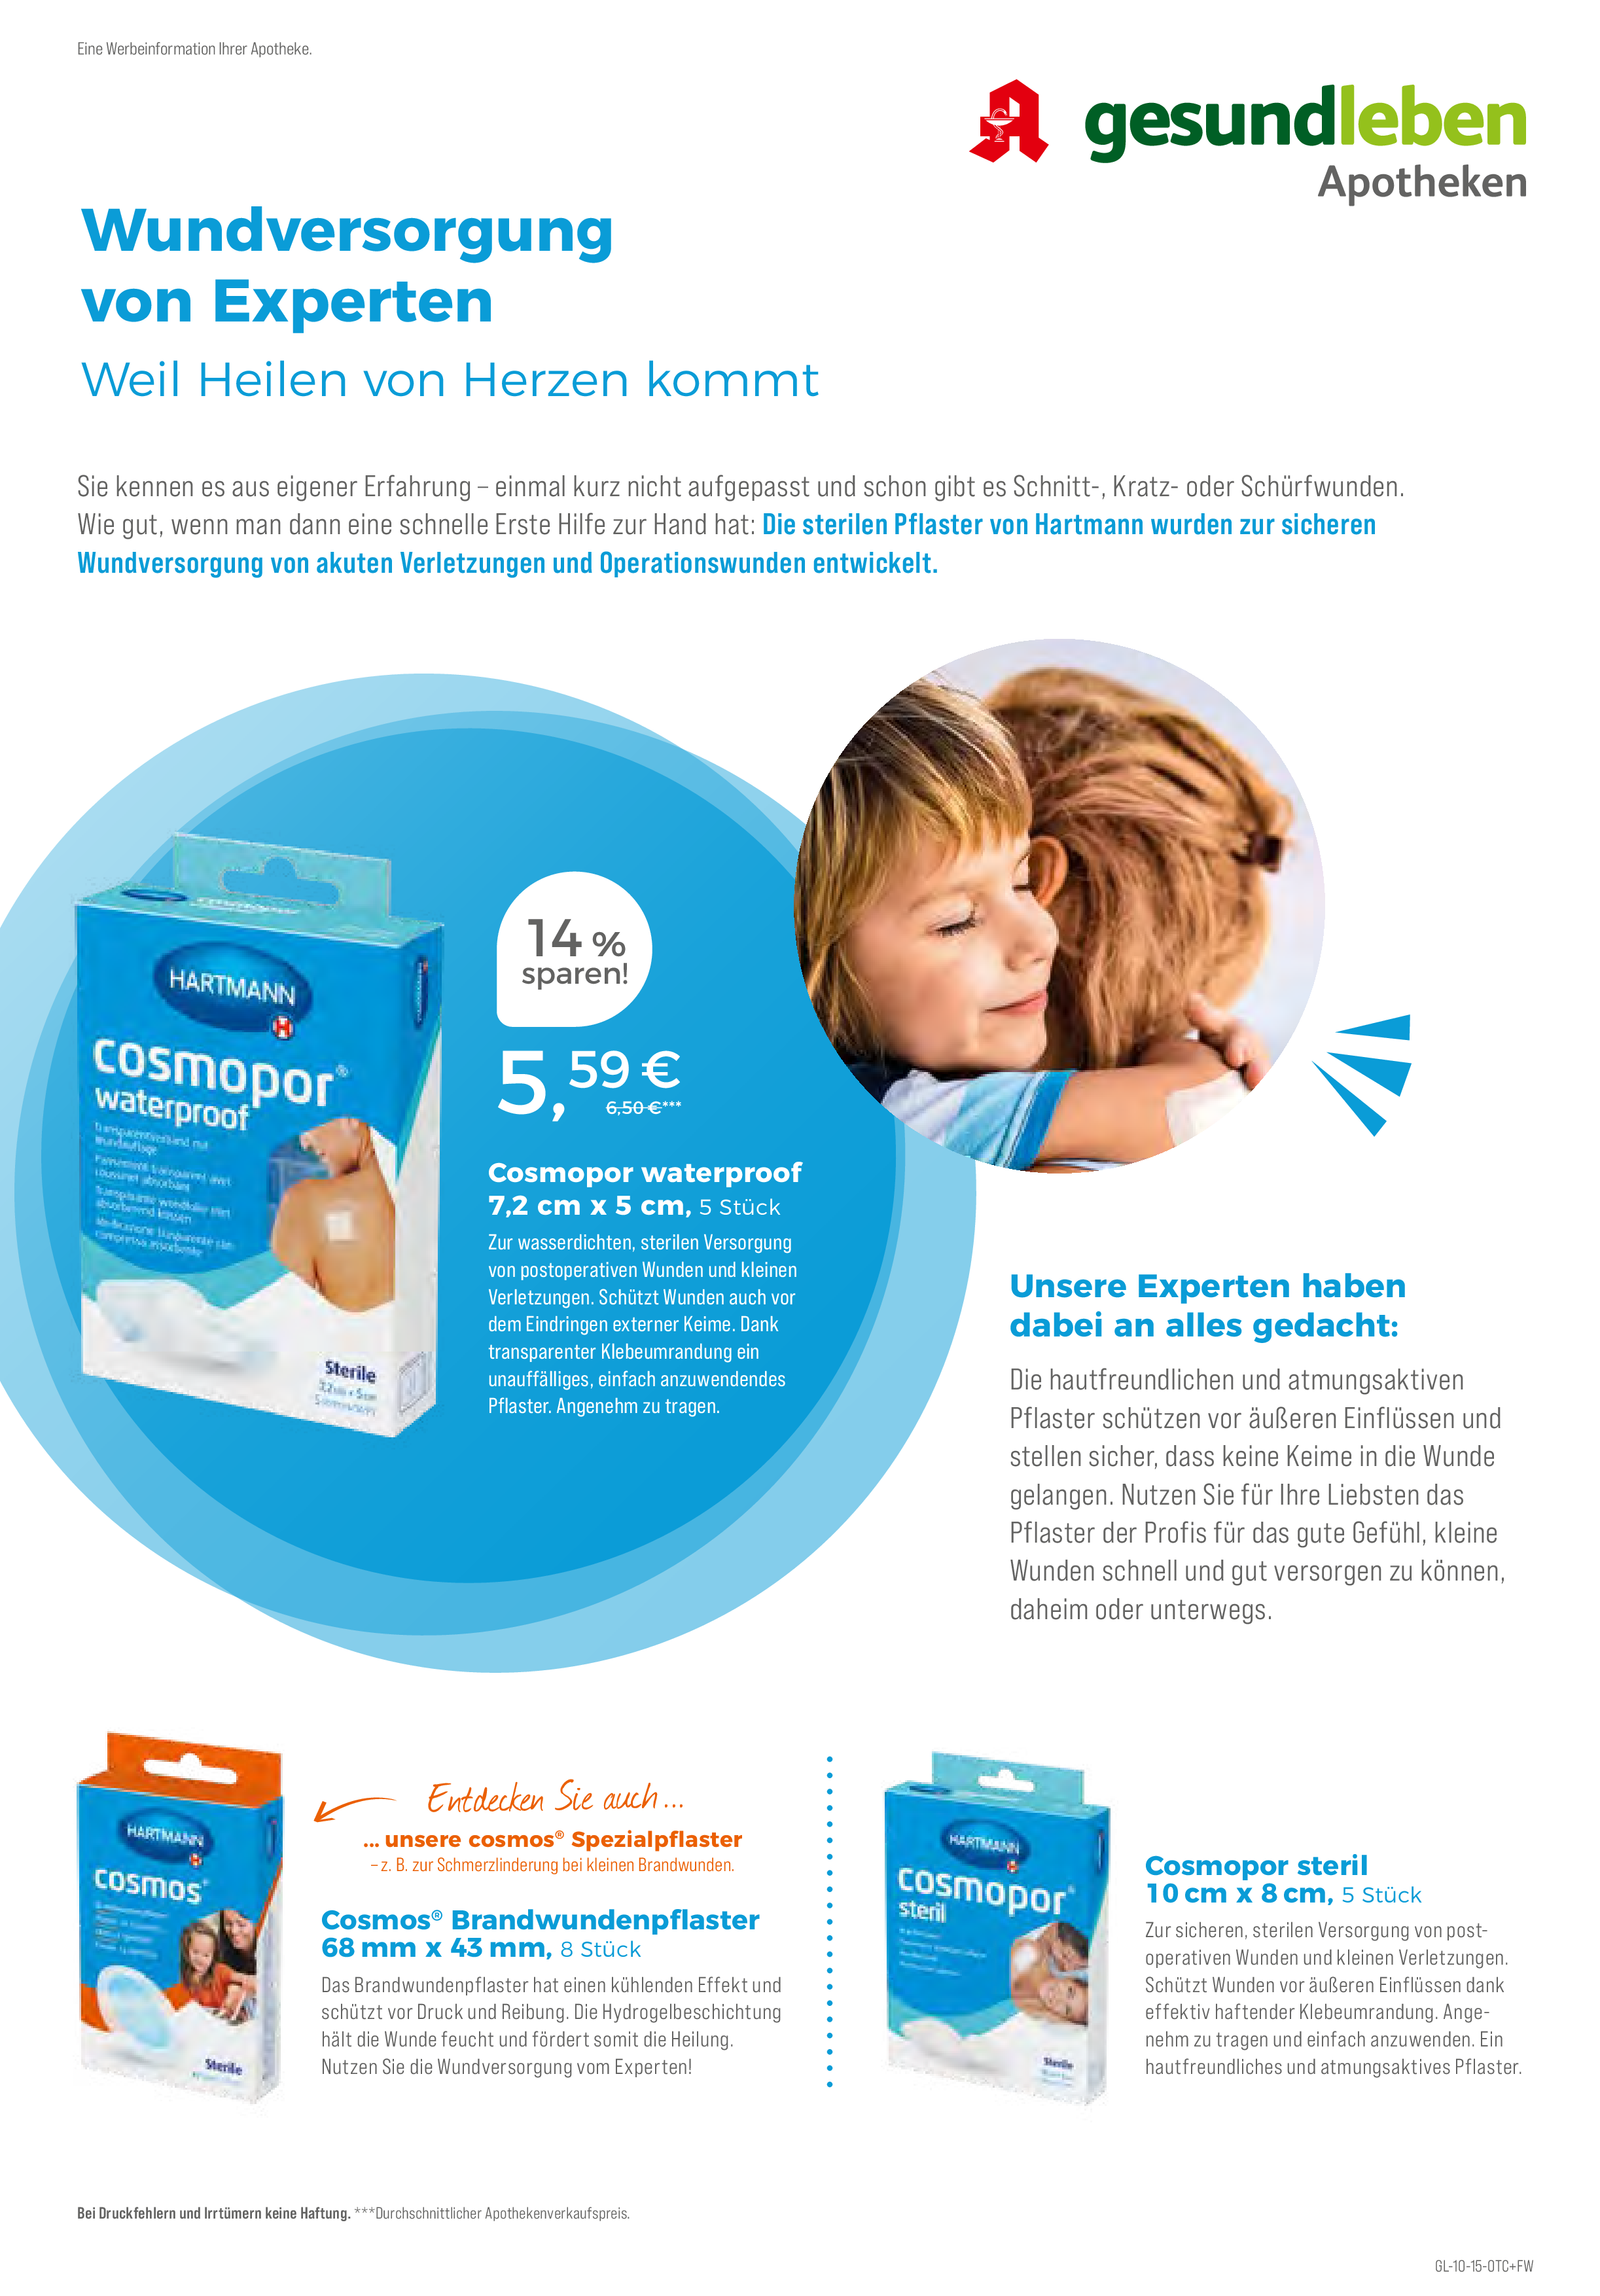 https://mein-uploads.apocdn.net/3912/leaflets/gesundleben_niedrig-Seite5.png